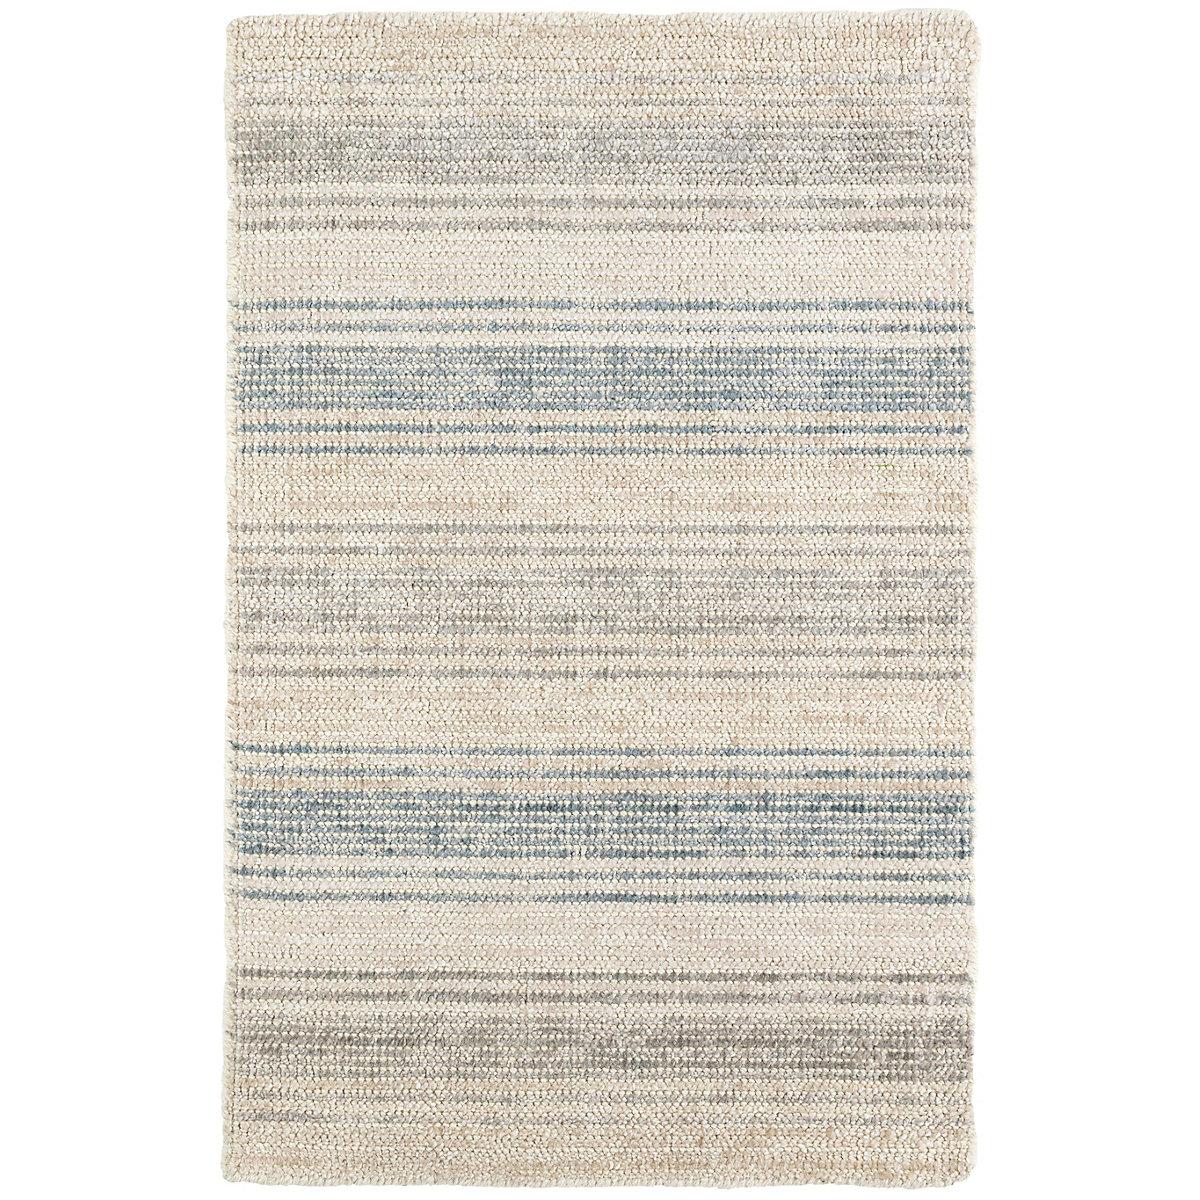 Moonshine woven cotton viscose rug dash albert for Dash and albert blankets